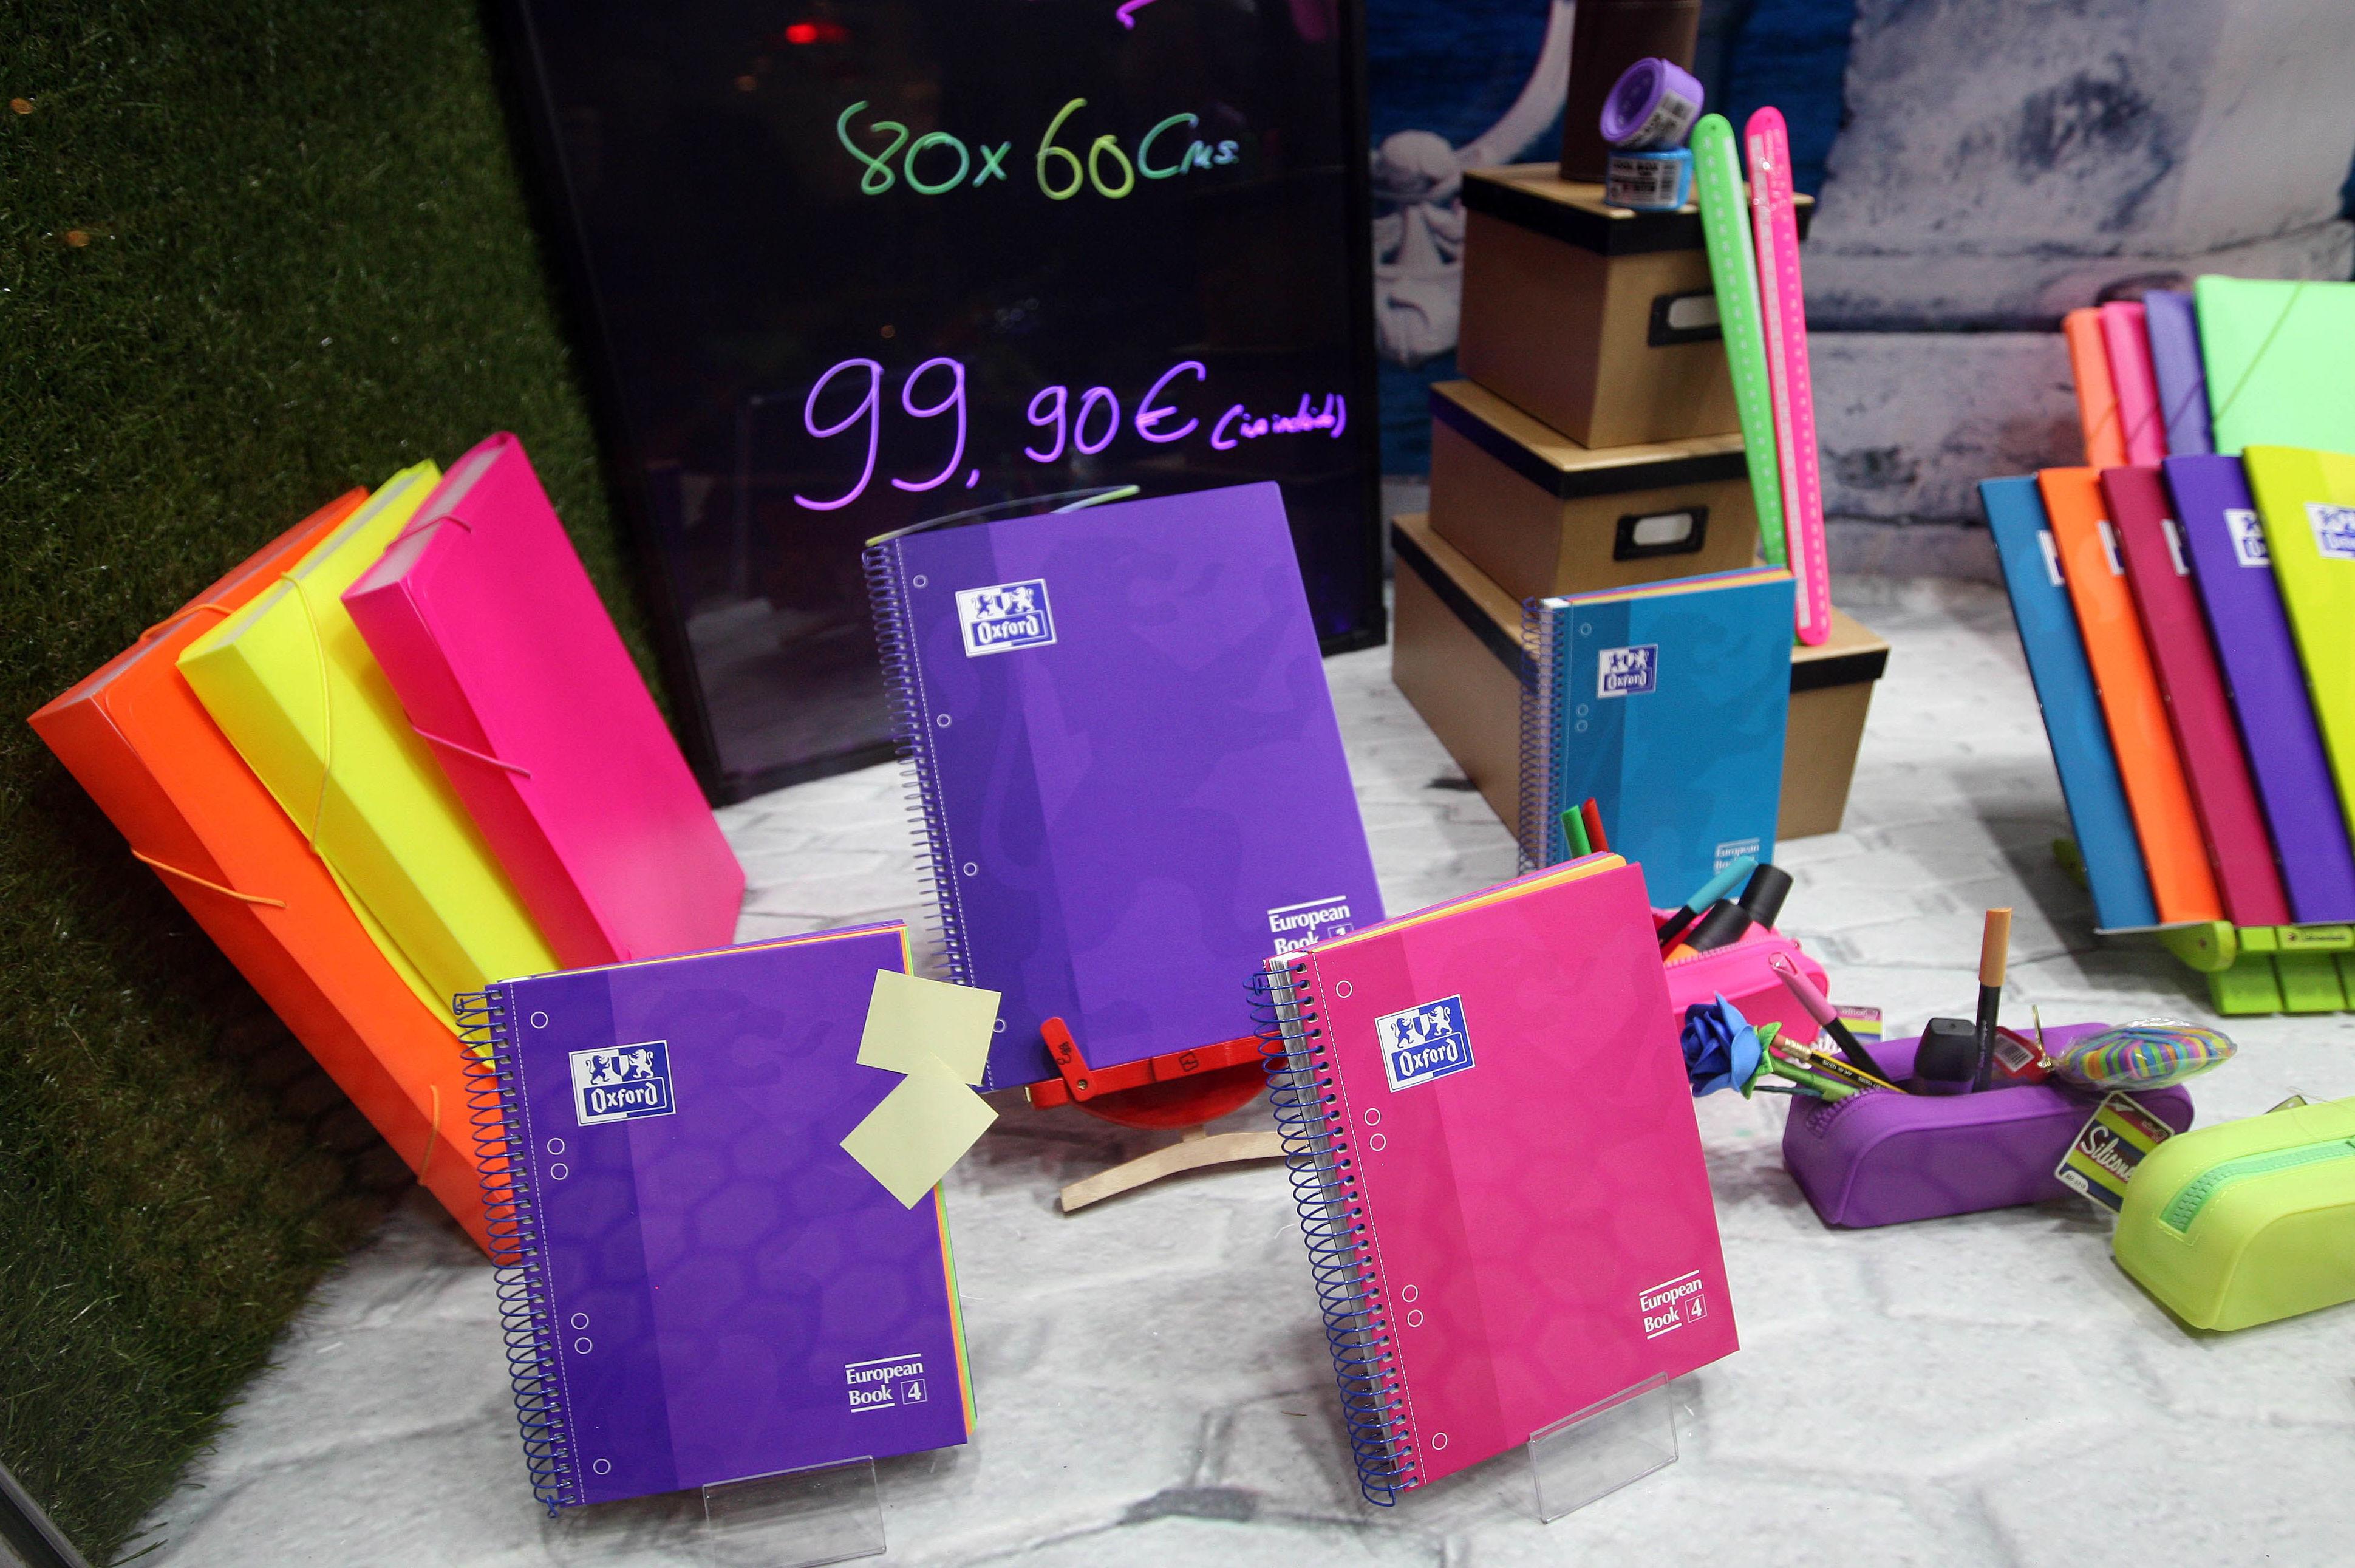 Foto 8 de Ofimática en Donostia-San Sebastián | Rosan